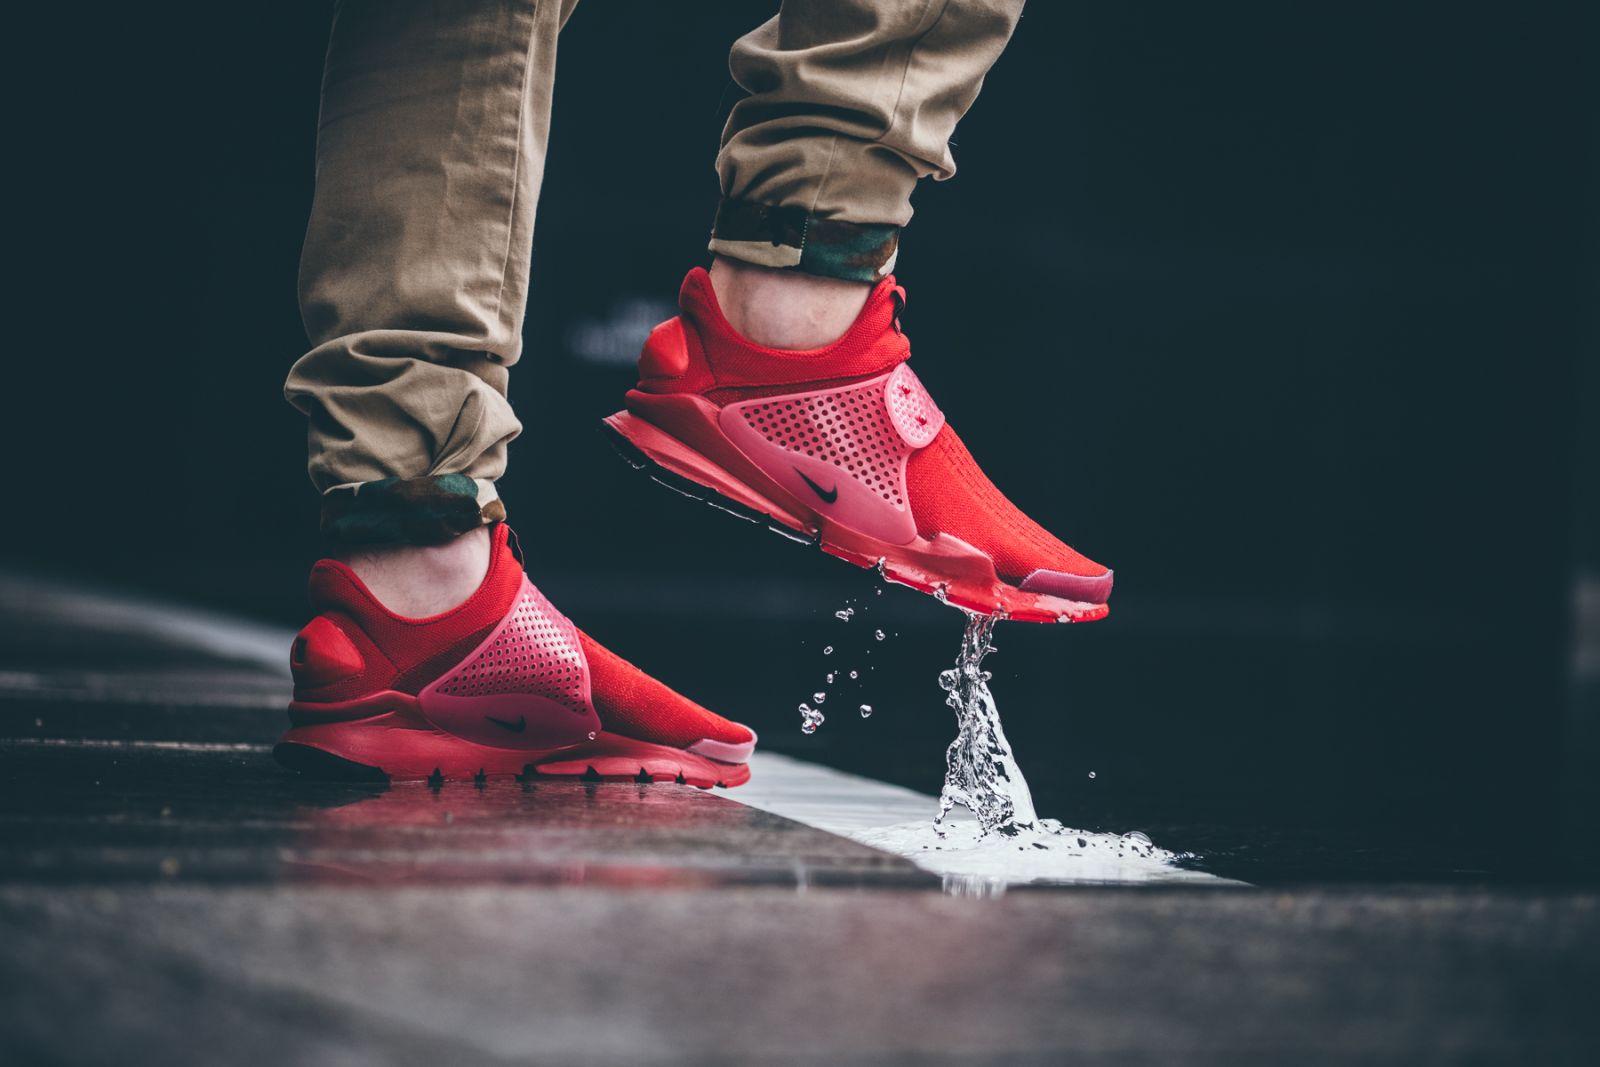 On Feet Shots of The Nike Sock Dart